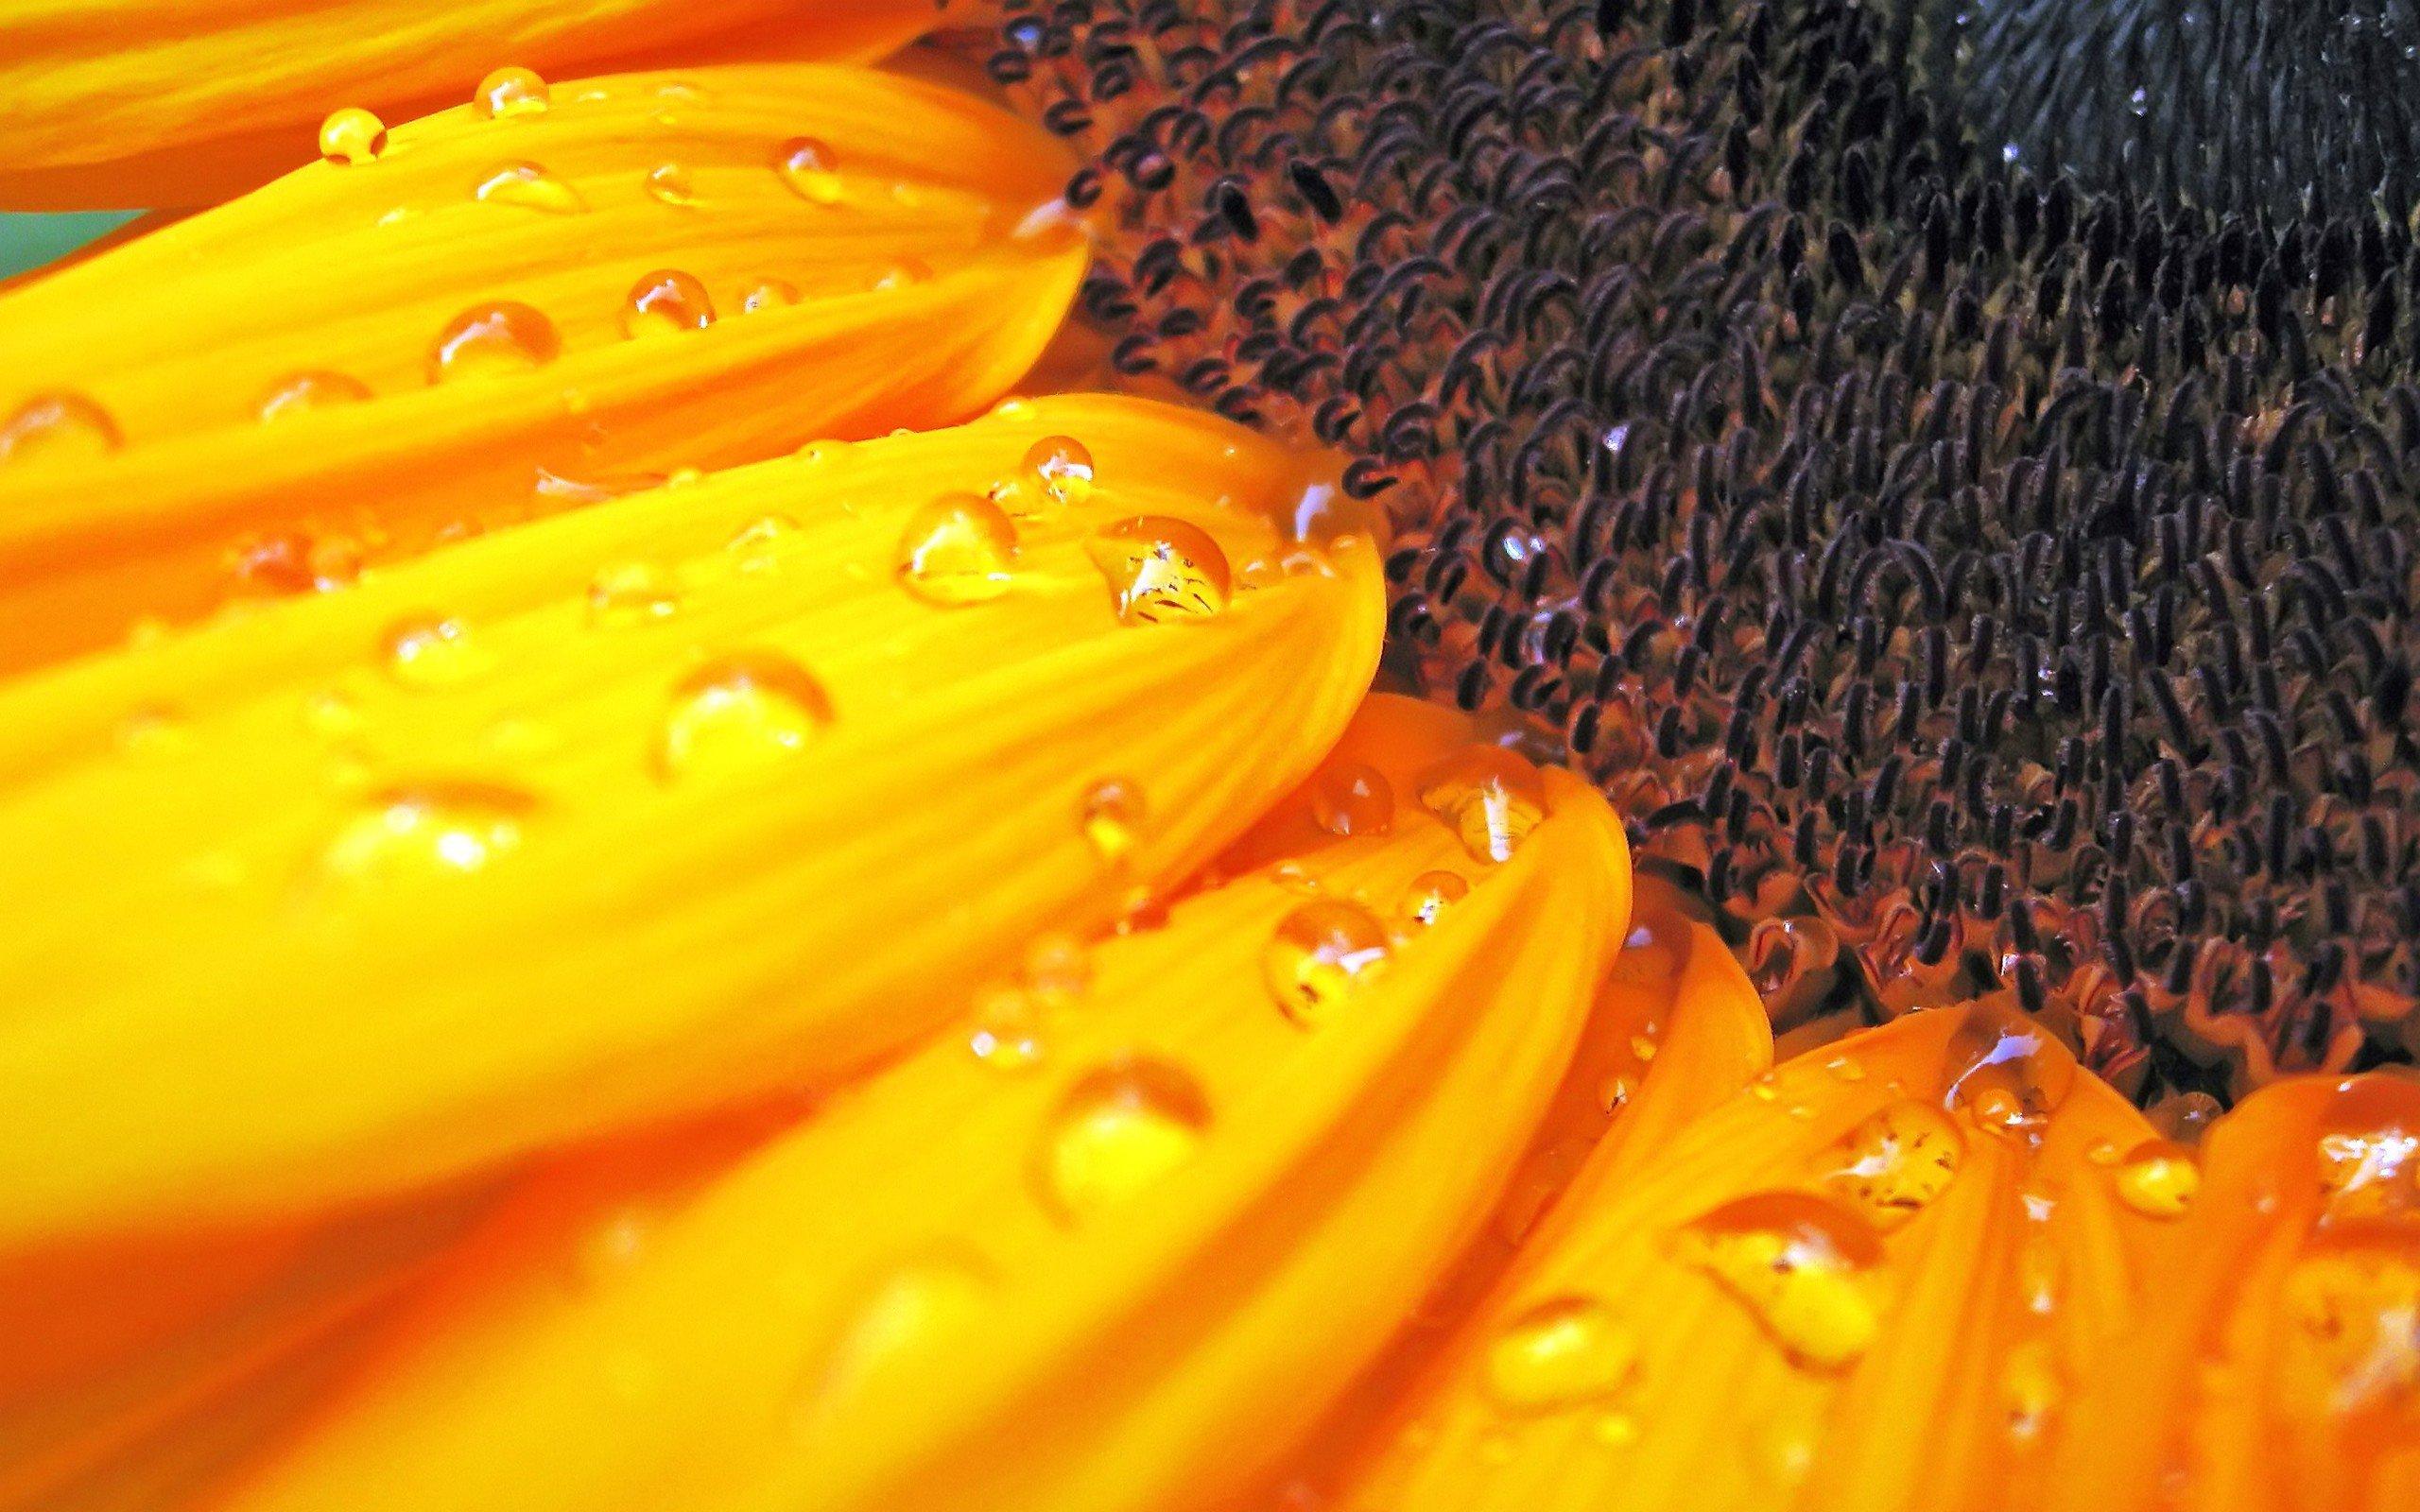 Sunflowers Macro Wallpapers Free Wallpapers